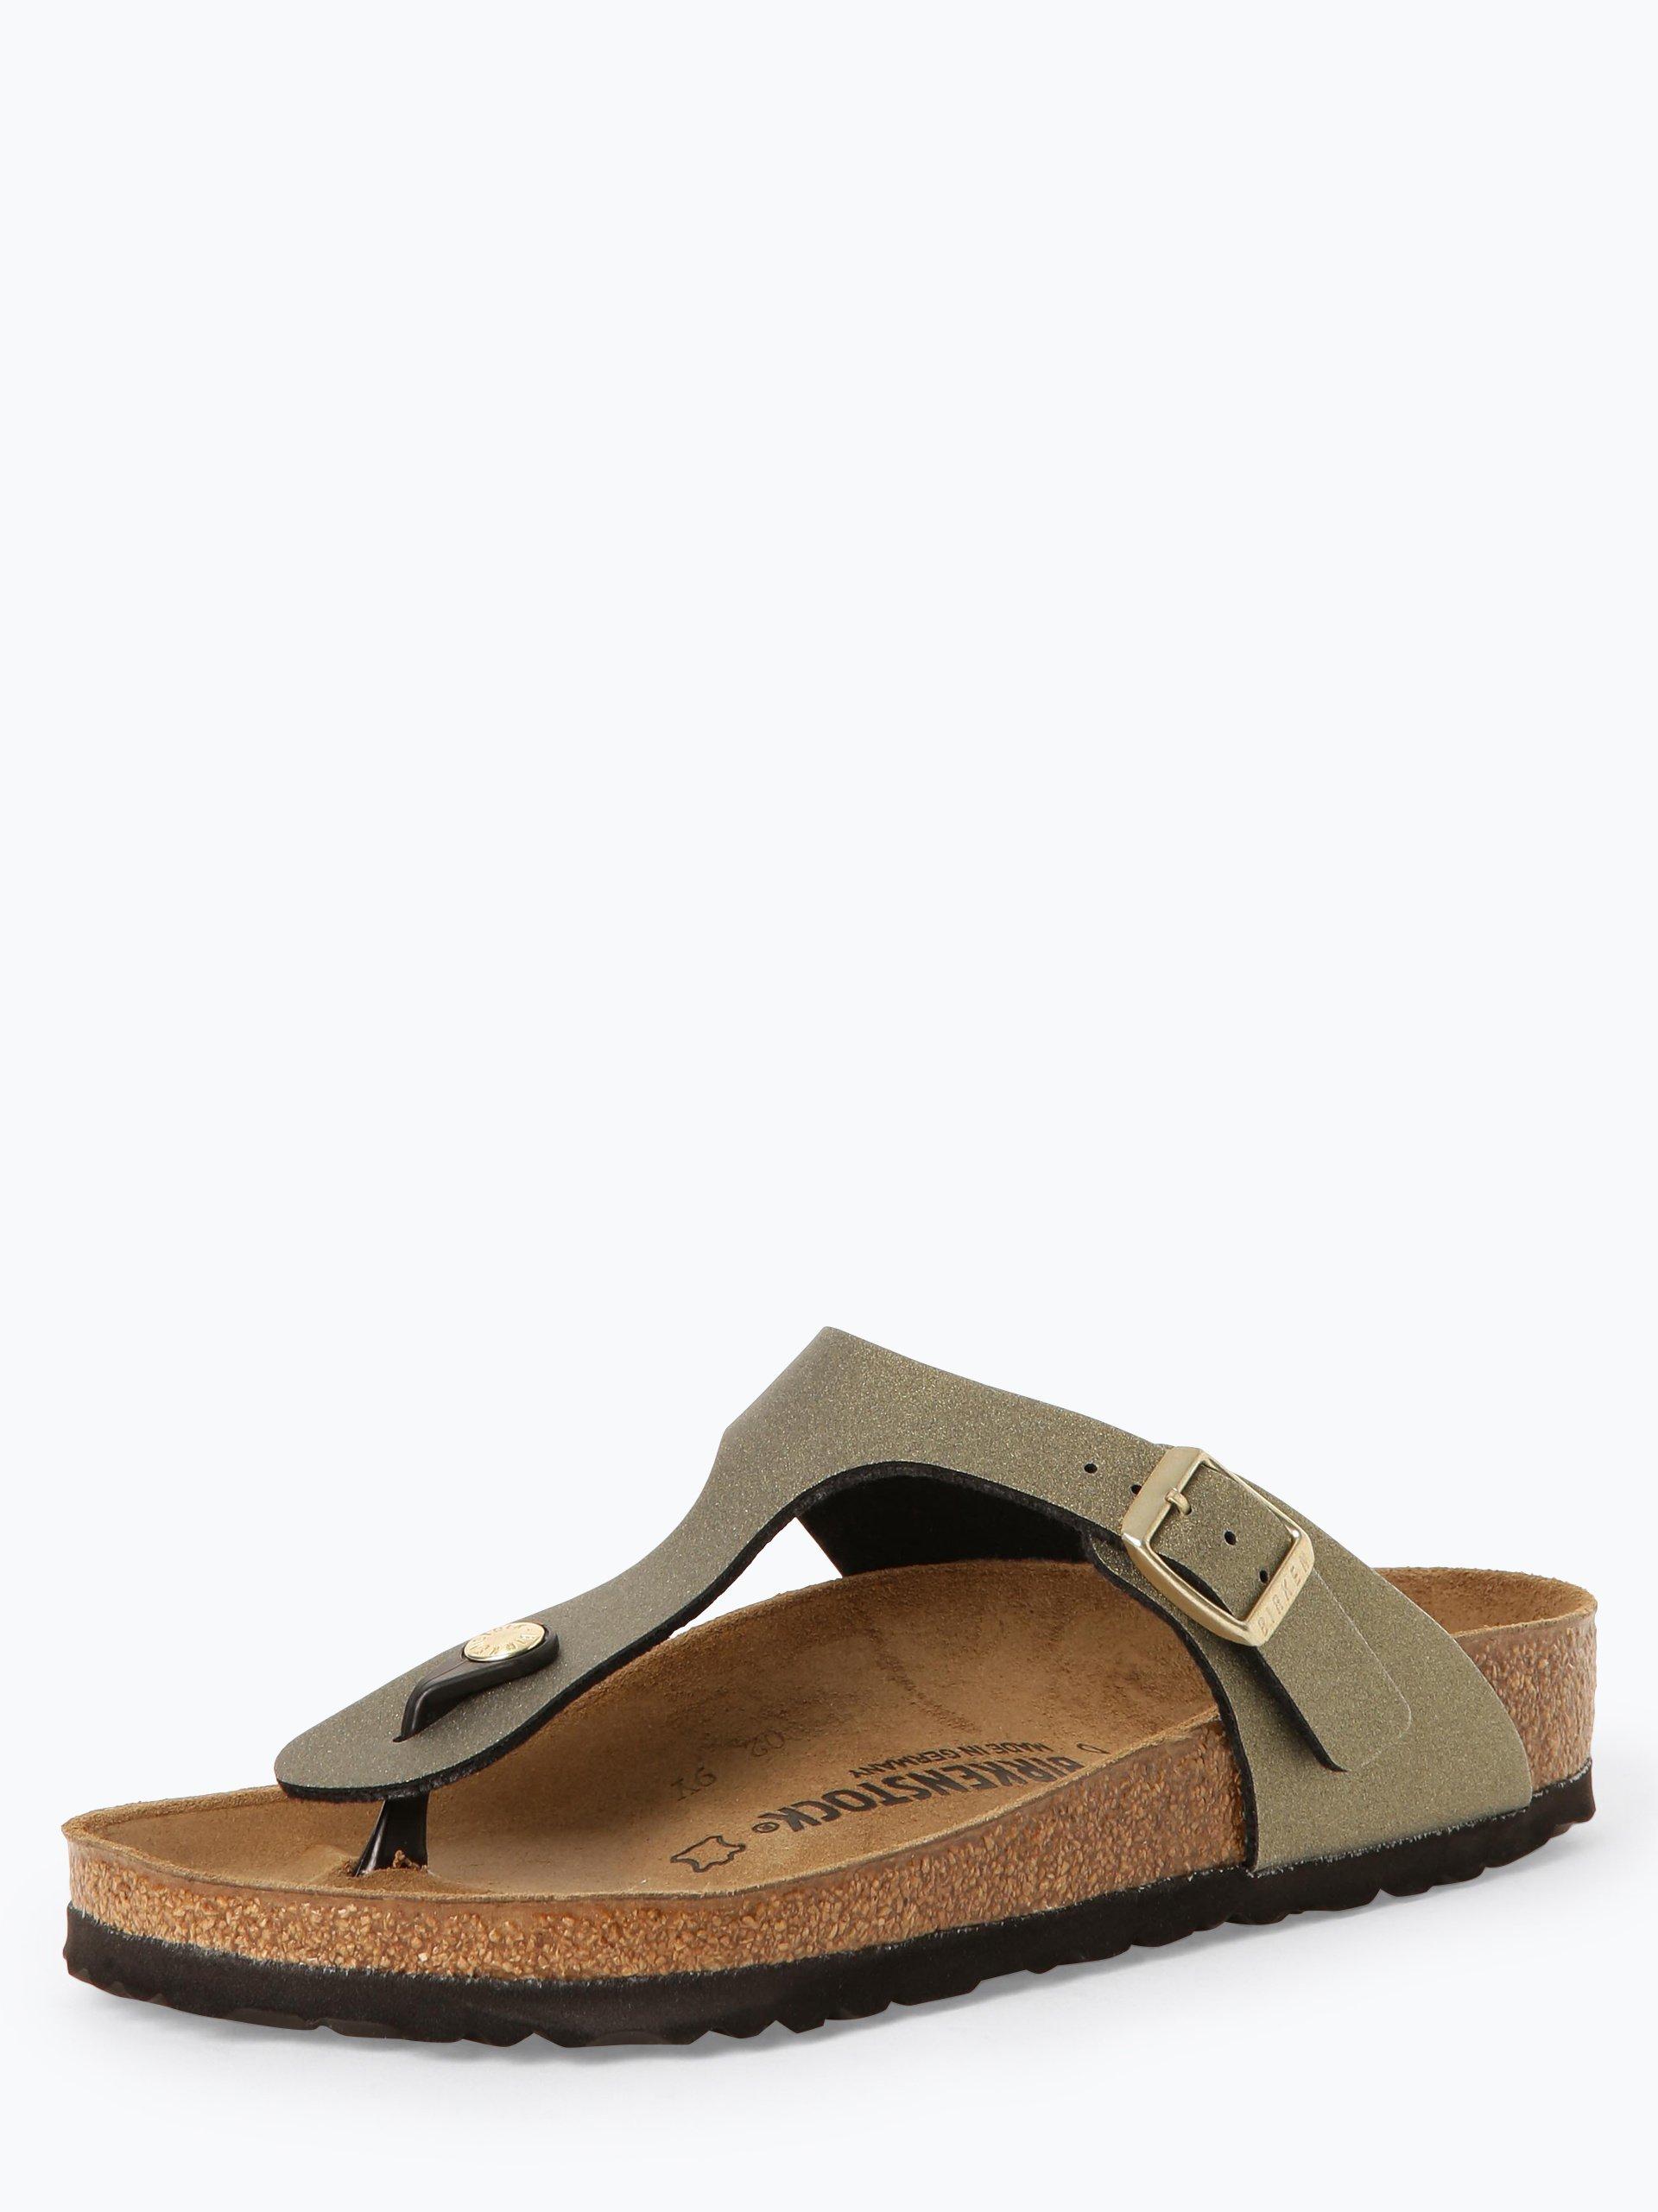 Birkenstock Damen Sandalen mit Leder-Anteil - Gizeh BS